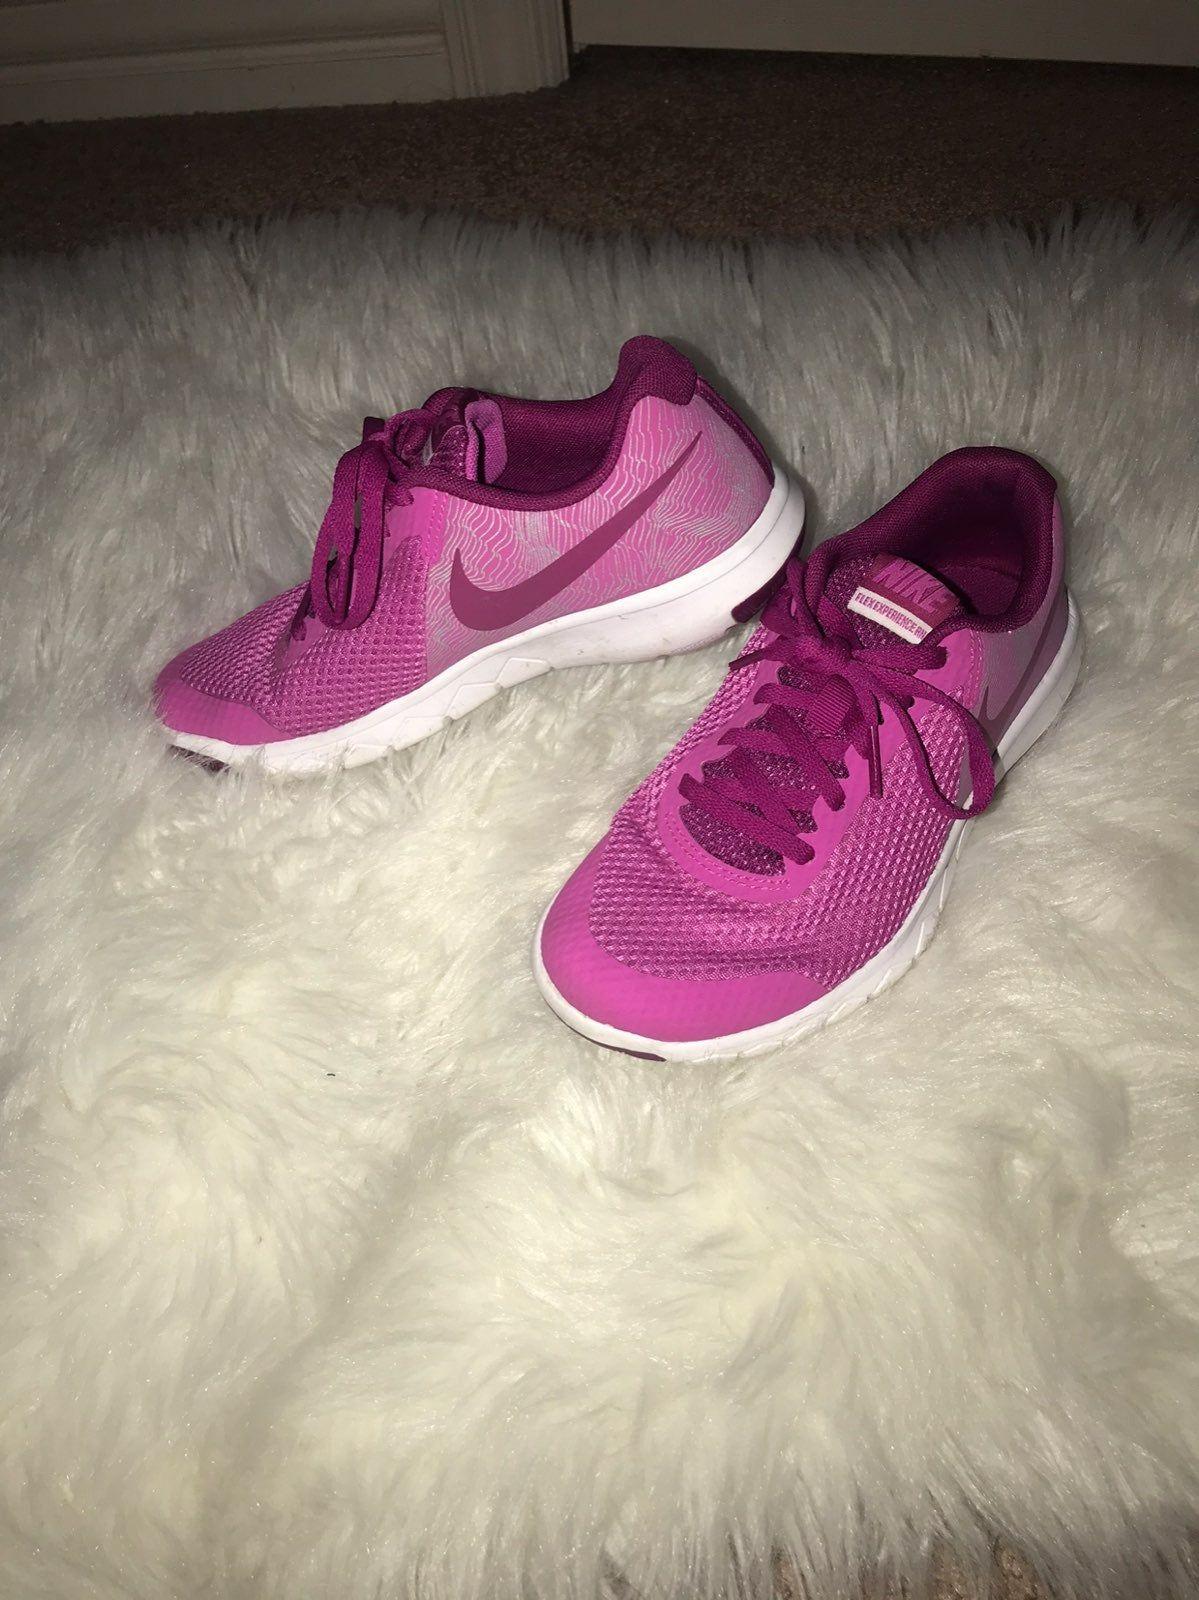 Size Youth 3.5 | Nike, Shoes, Nike shoes